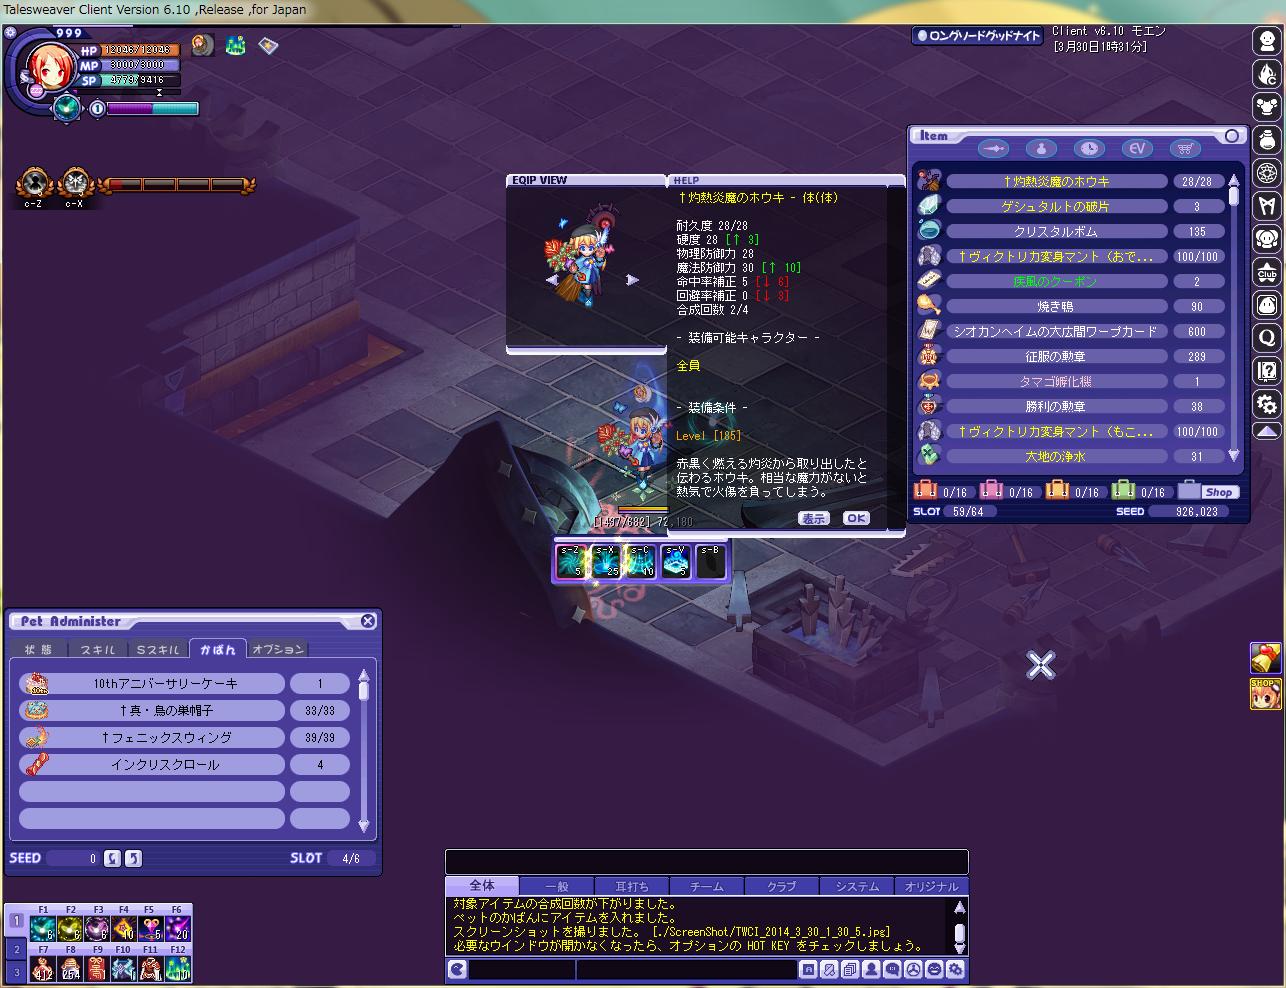 screenshot285.png